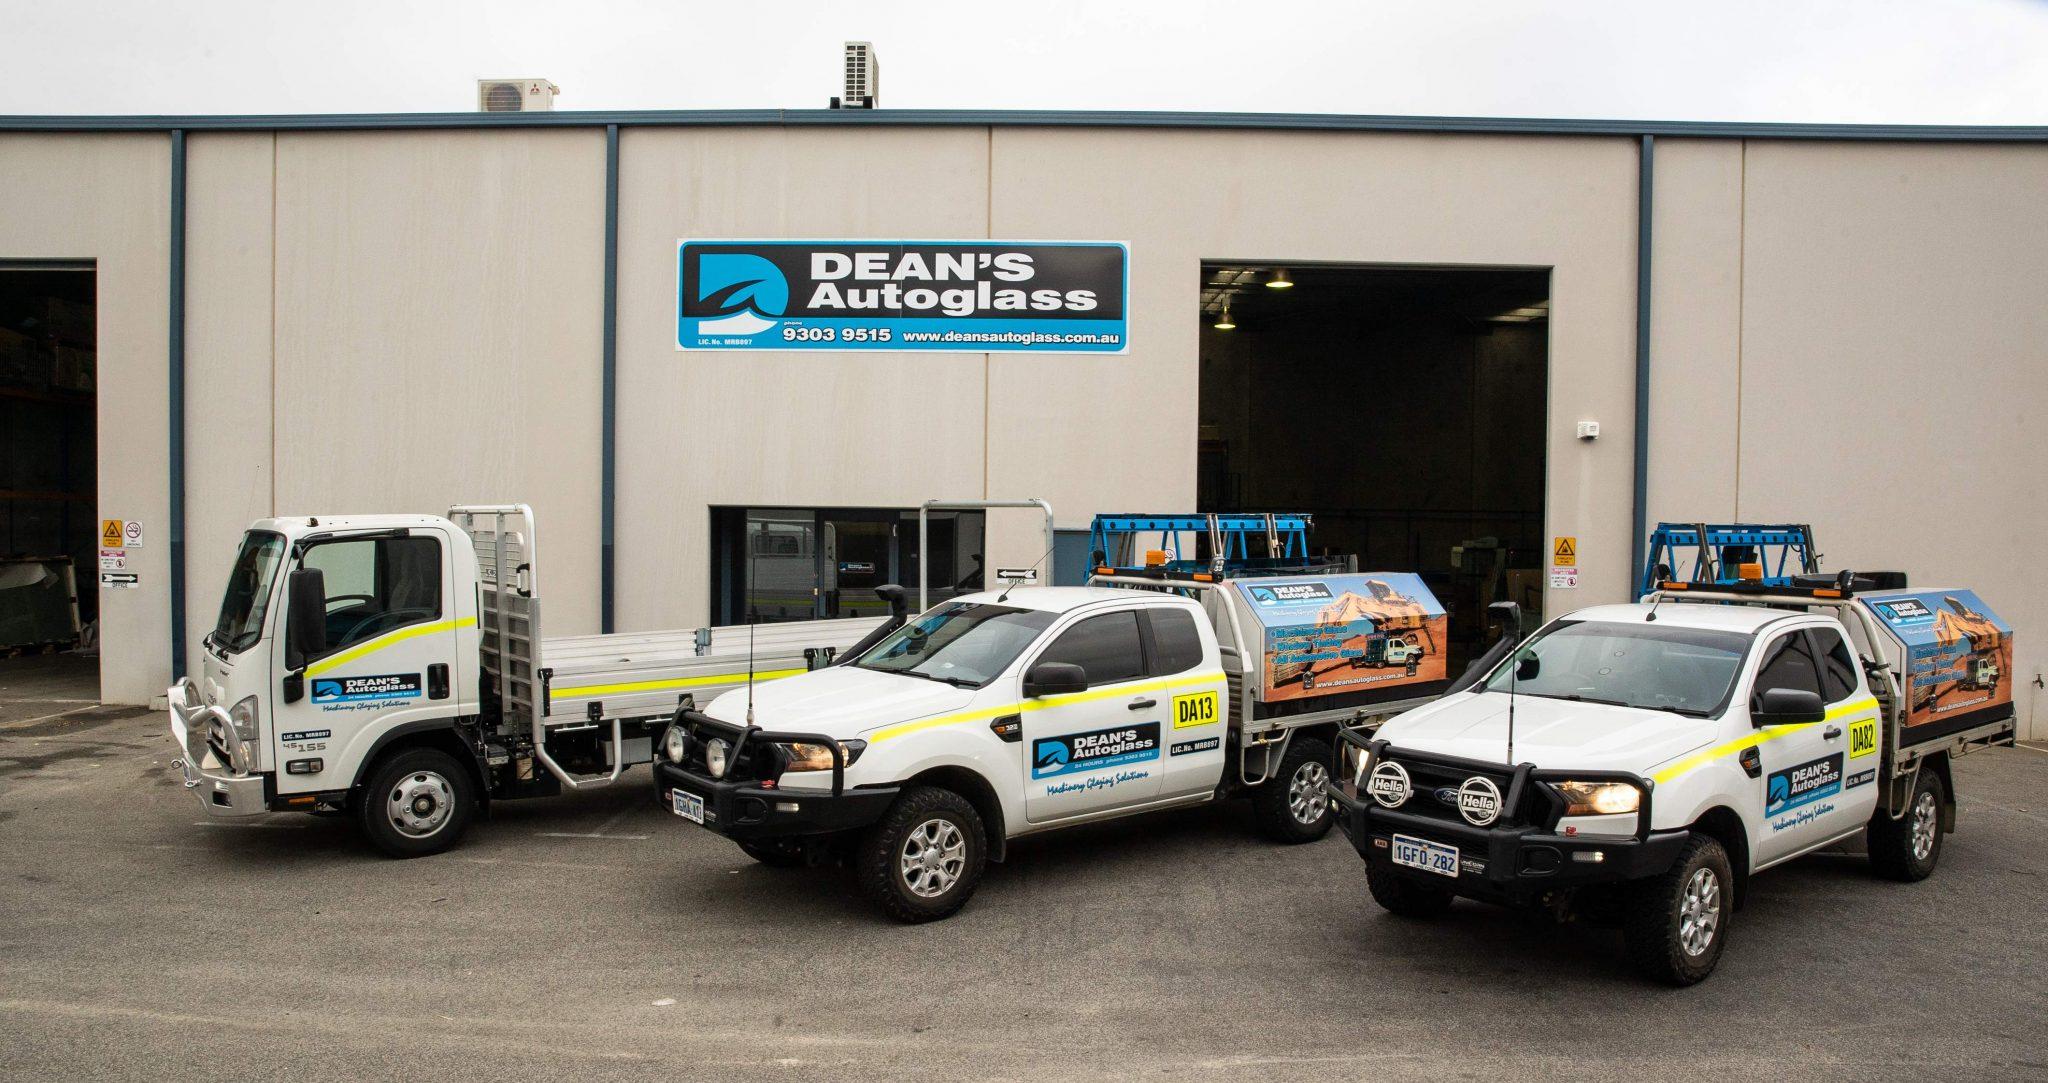 Dean's Autoglass Perth